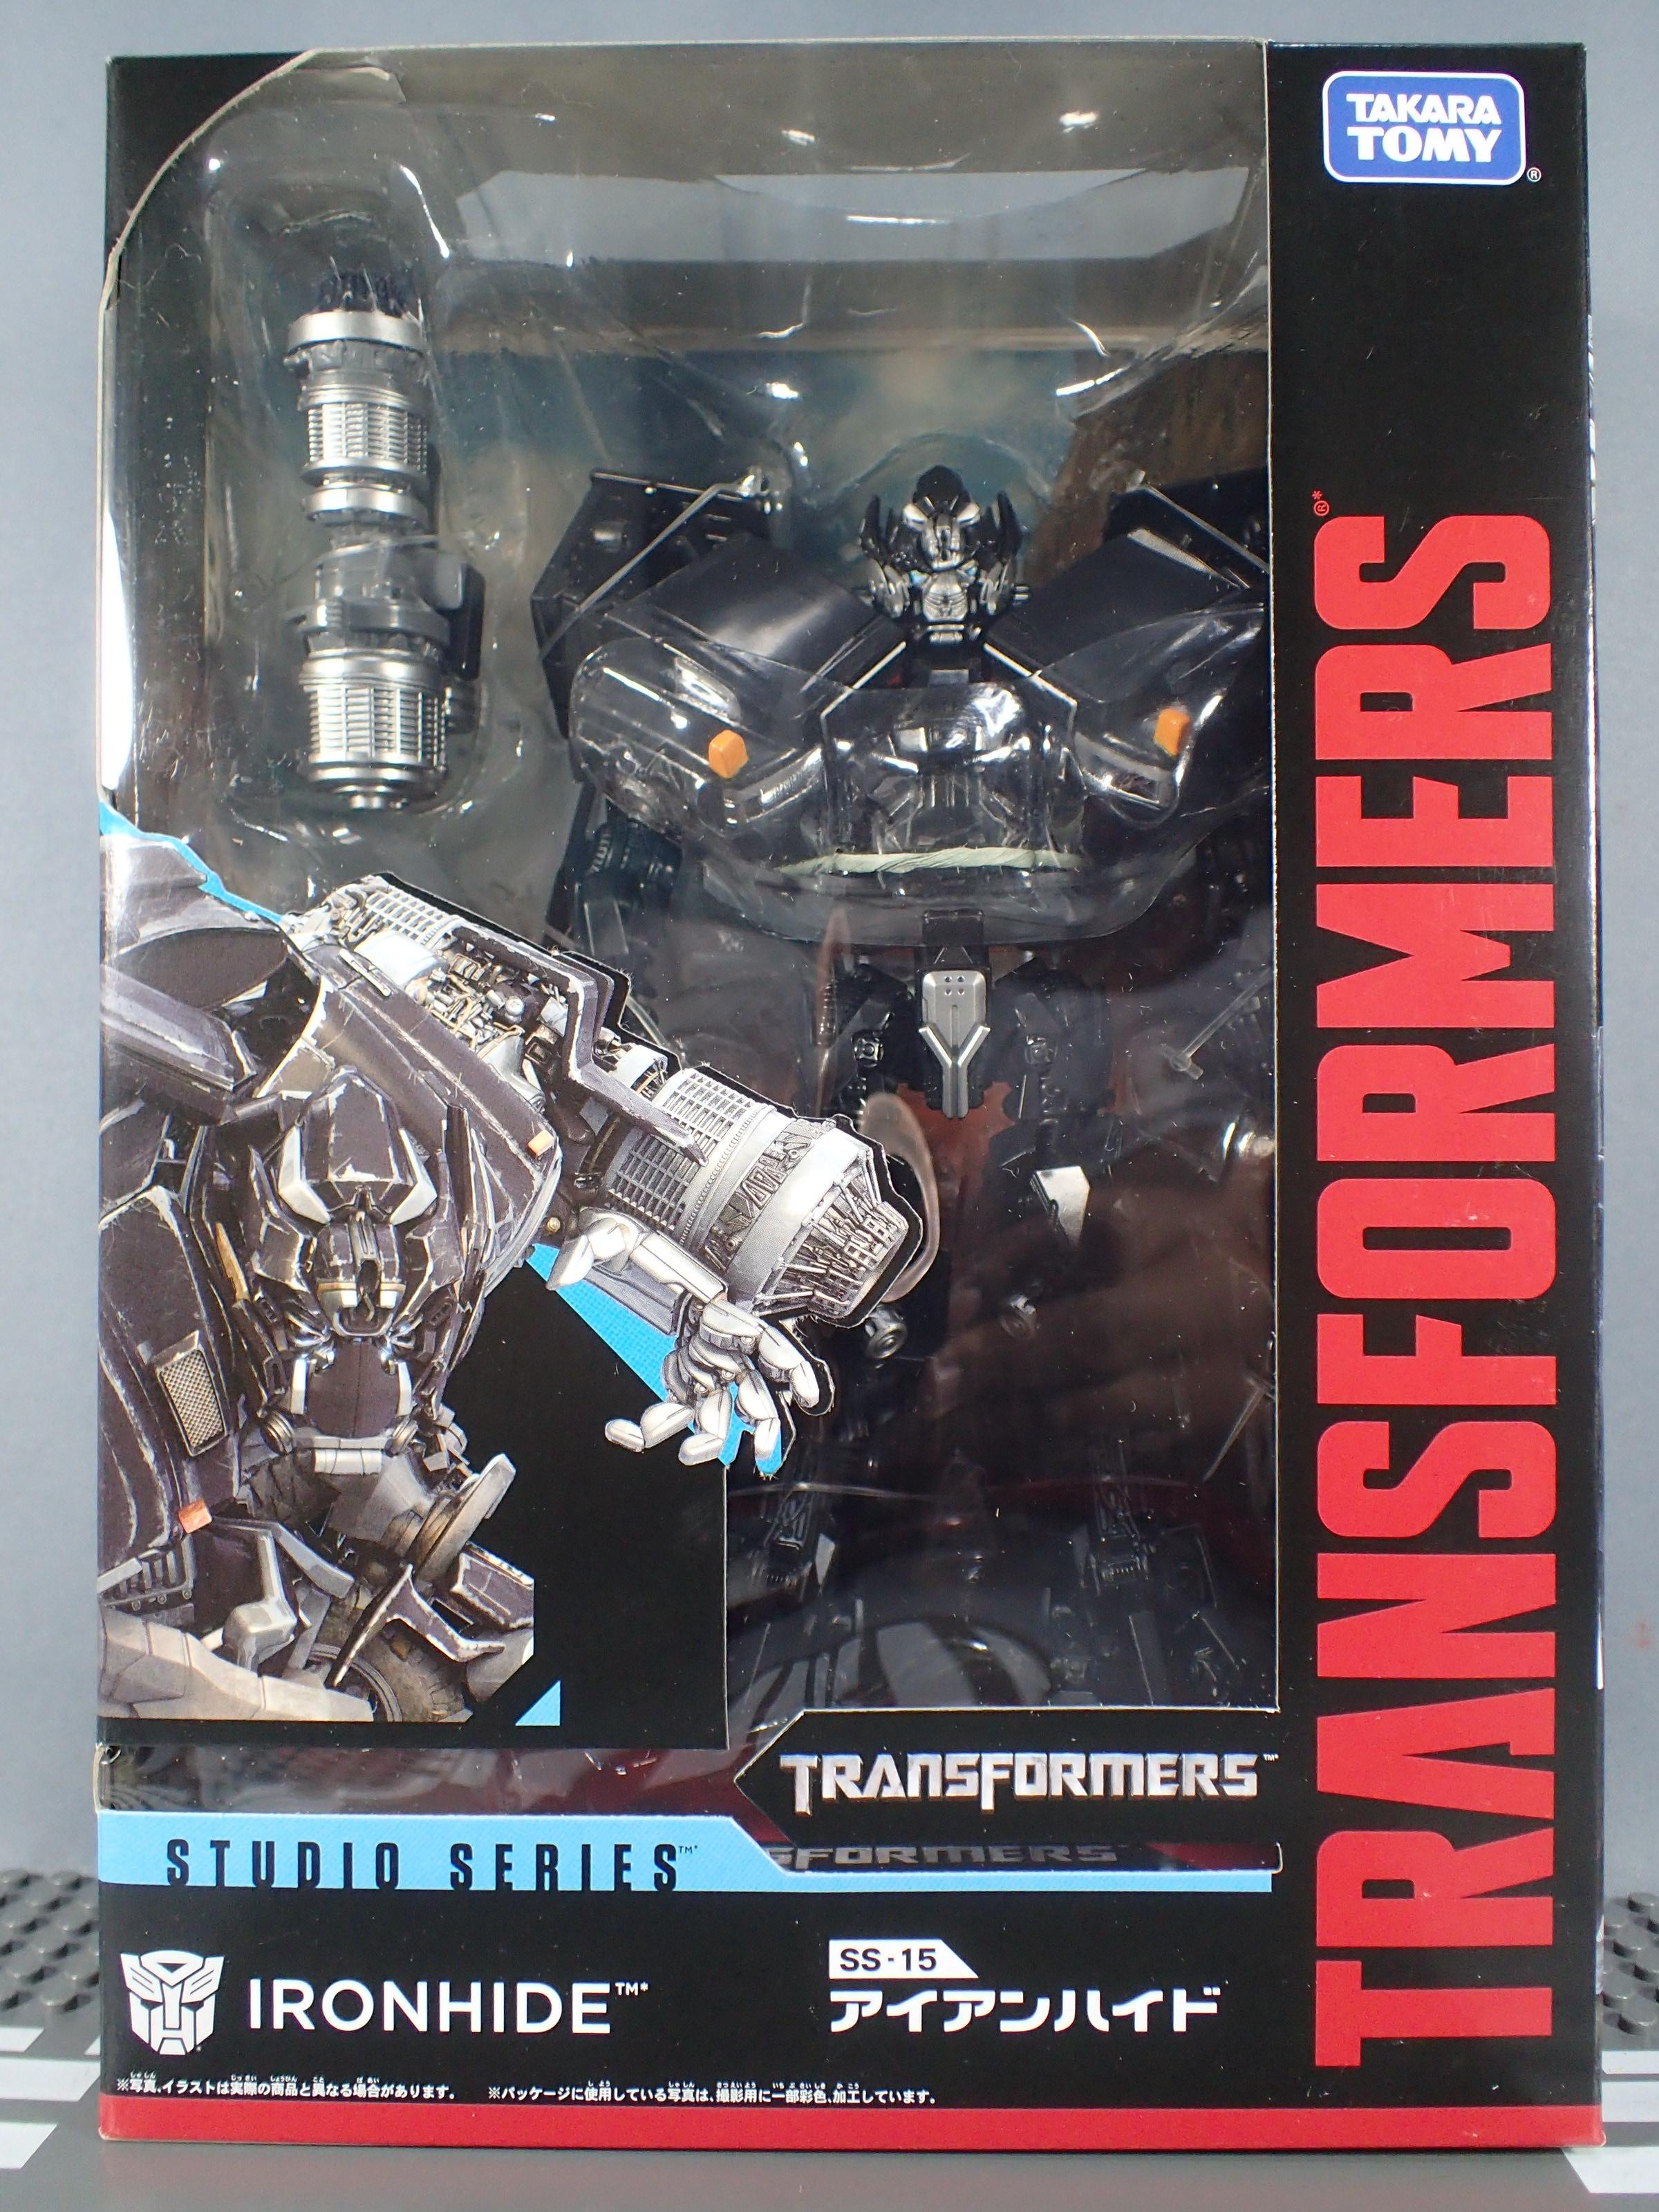 Transformers SS-15 Ironhide